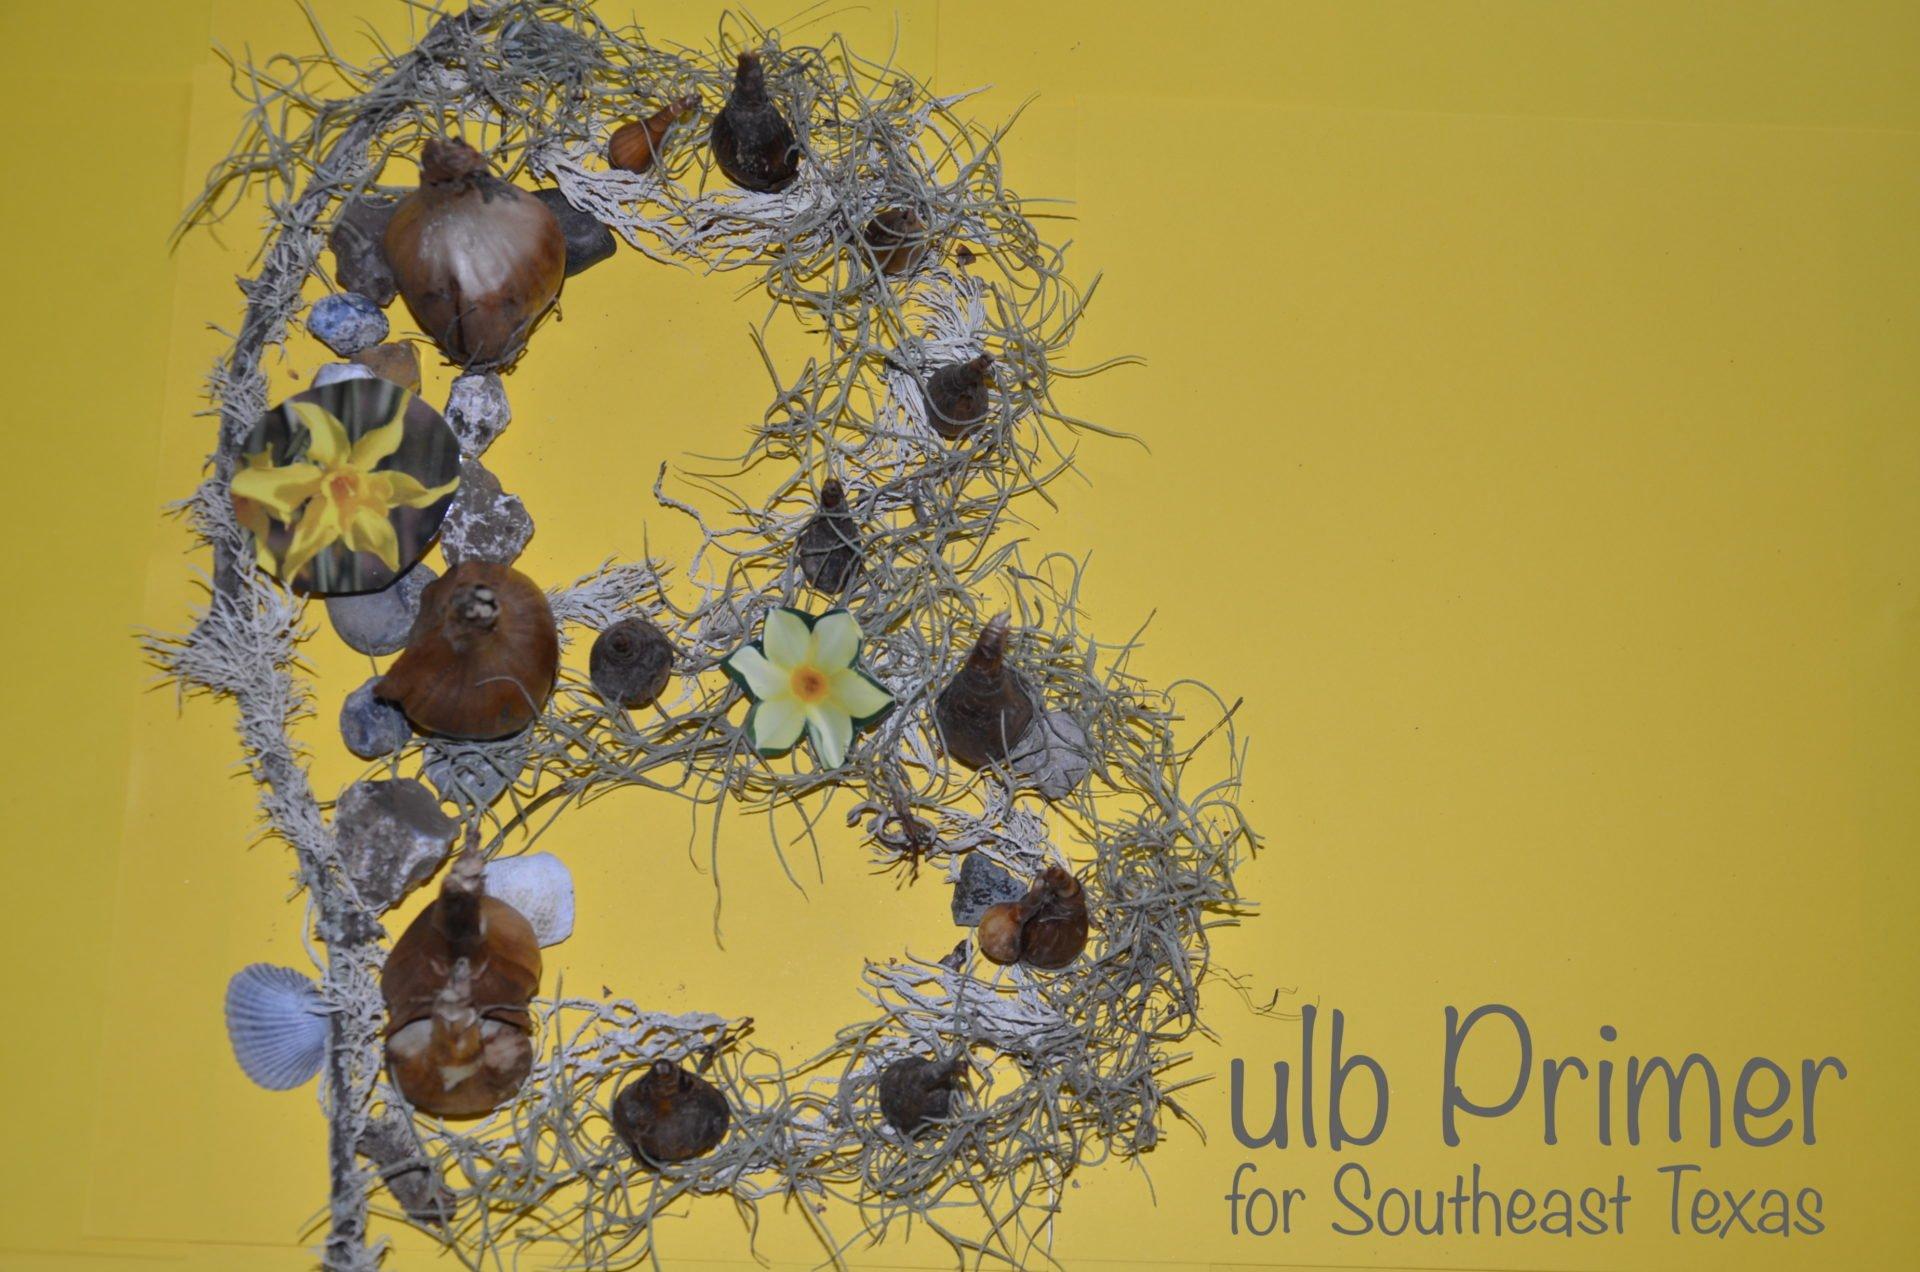 Bulb Primer for Southeast Texas